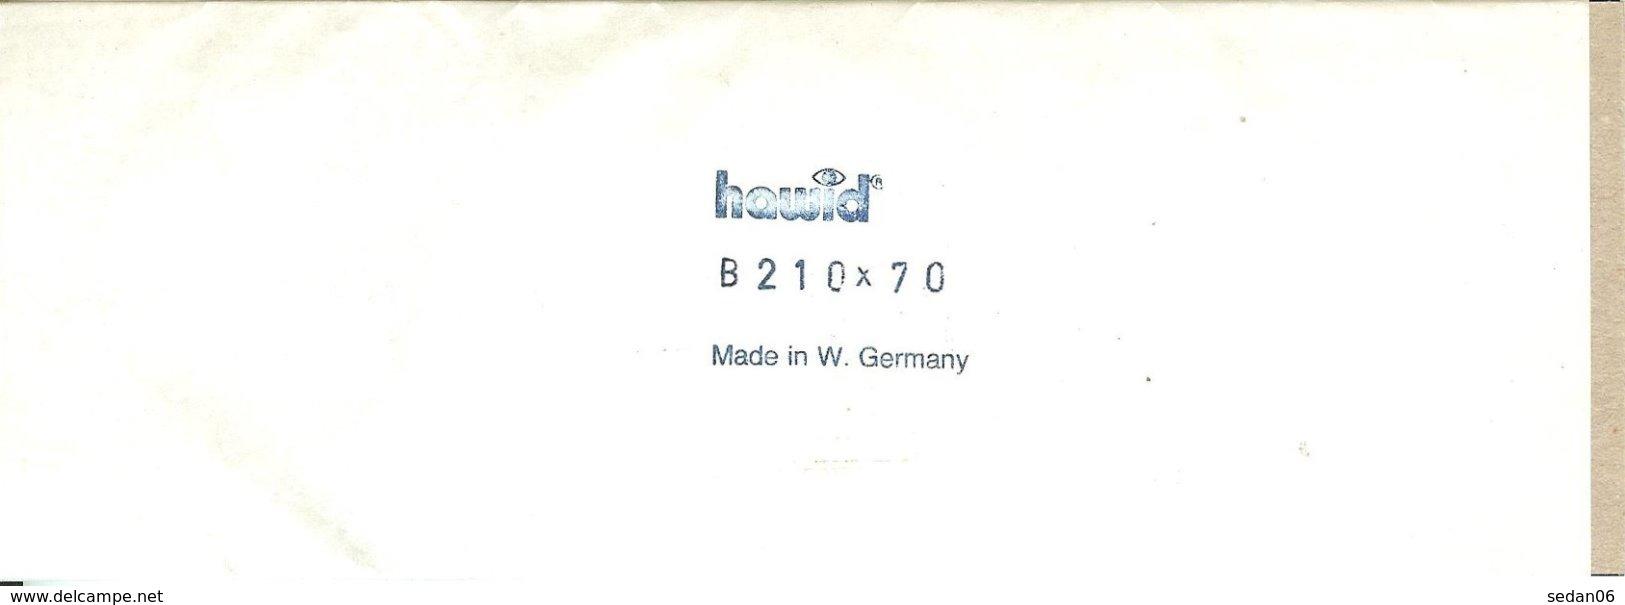 HAWID - Blocs 210x70 Fond Noir - Bandes Cristal